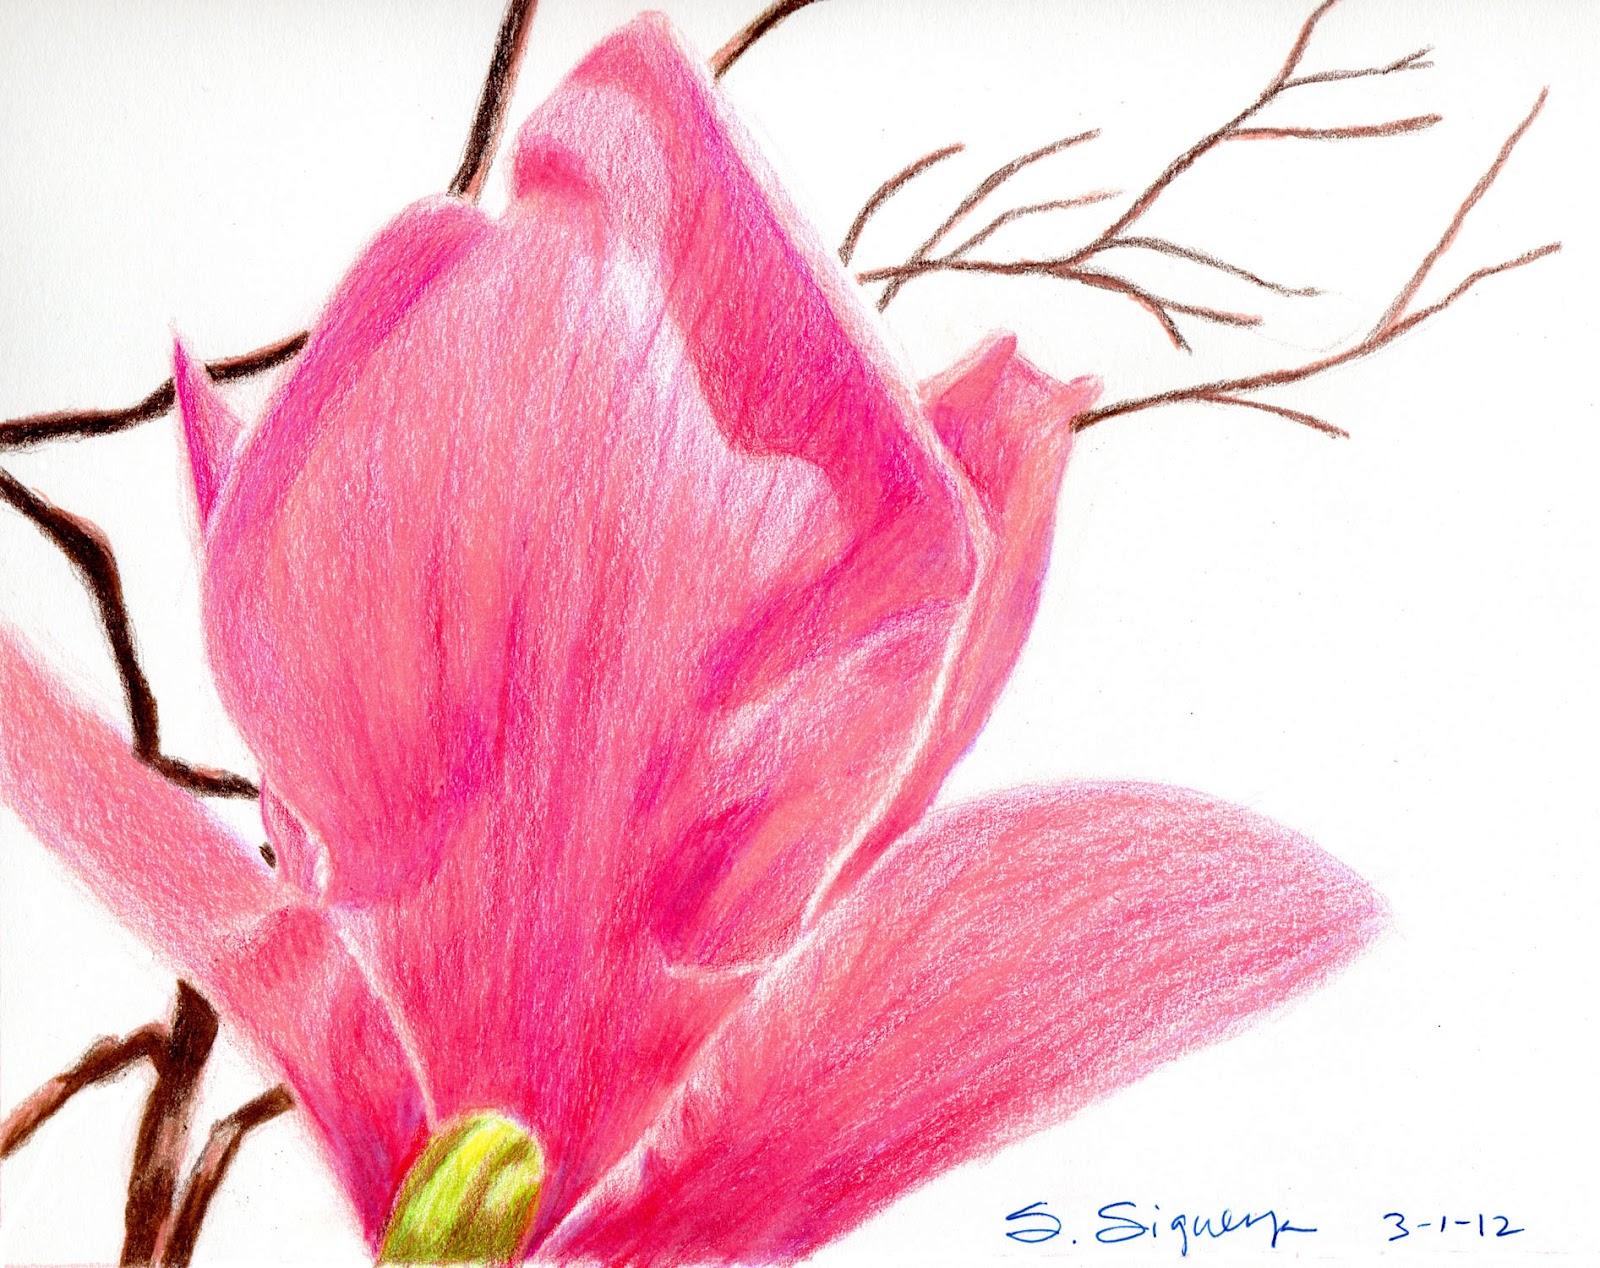 Pink Magnolia Tree Blossom